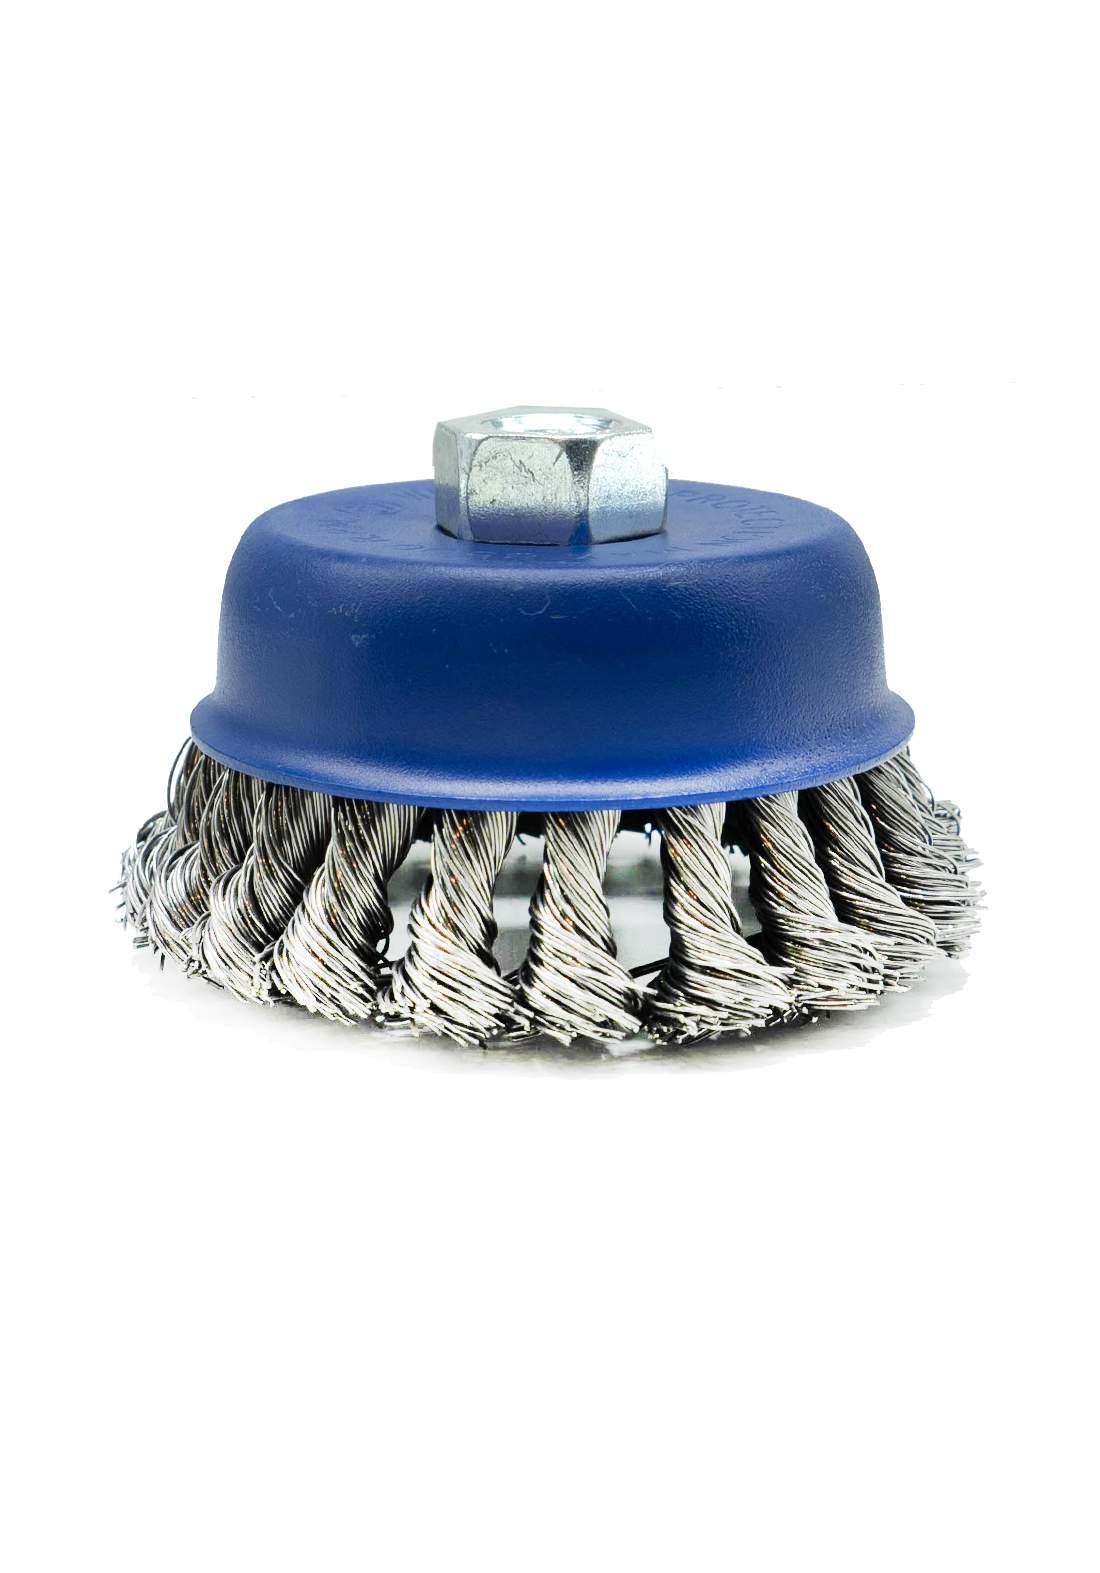 Sali 5074 Brush Inox For Drilling Machine 70 mm فرشاة تنظيف الاسطح المعدنية